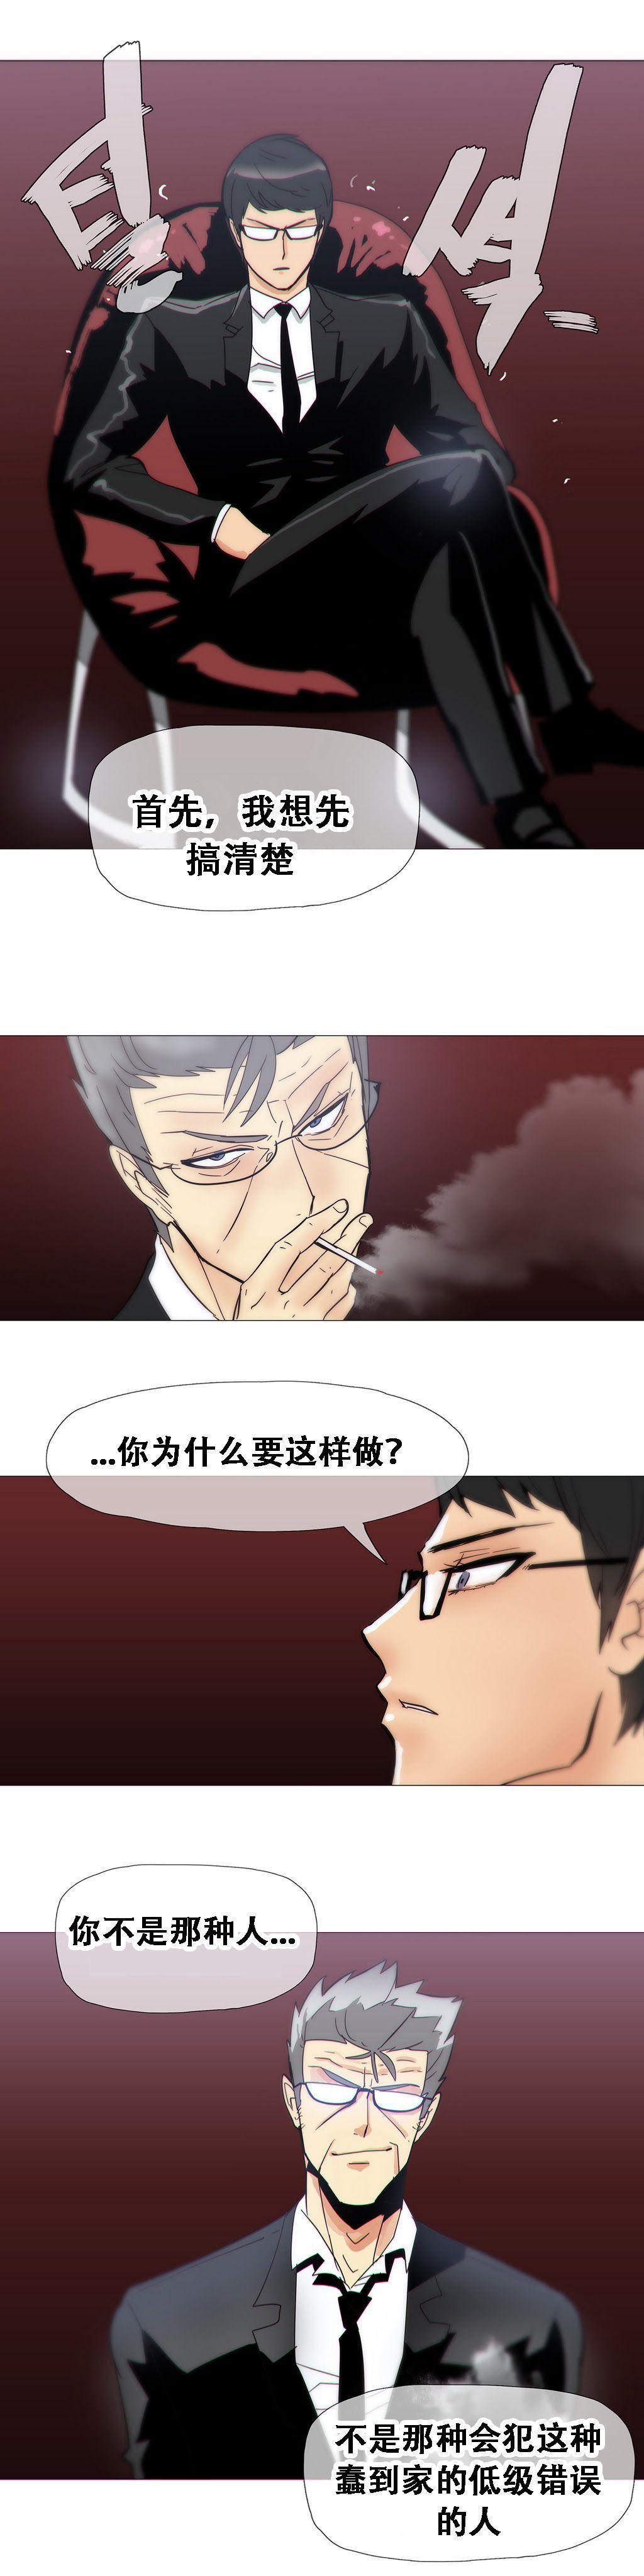 HouseHold Affairs 【卞赤鲤个人汉化】1~33话(持续更新中) 330